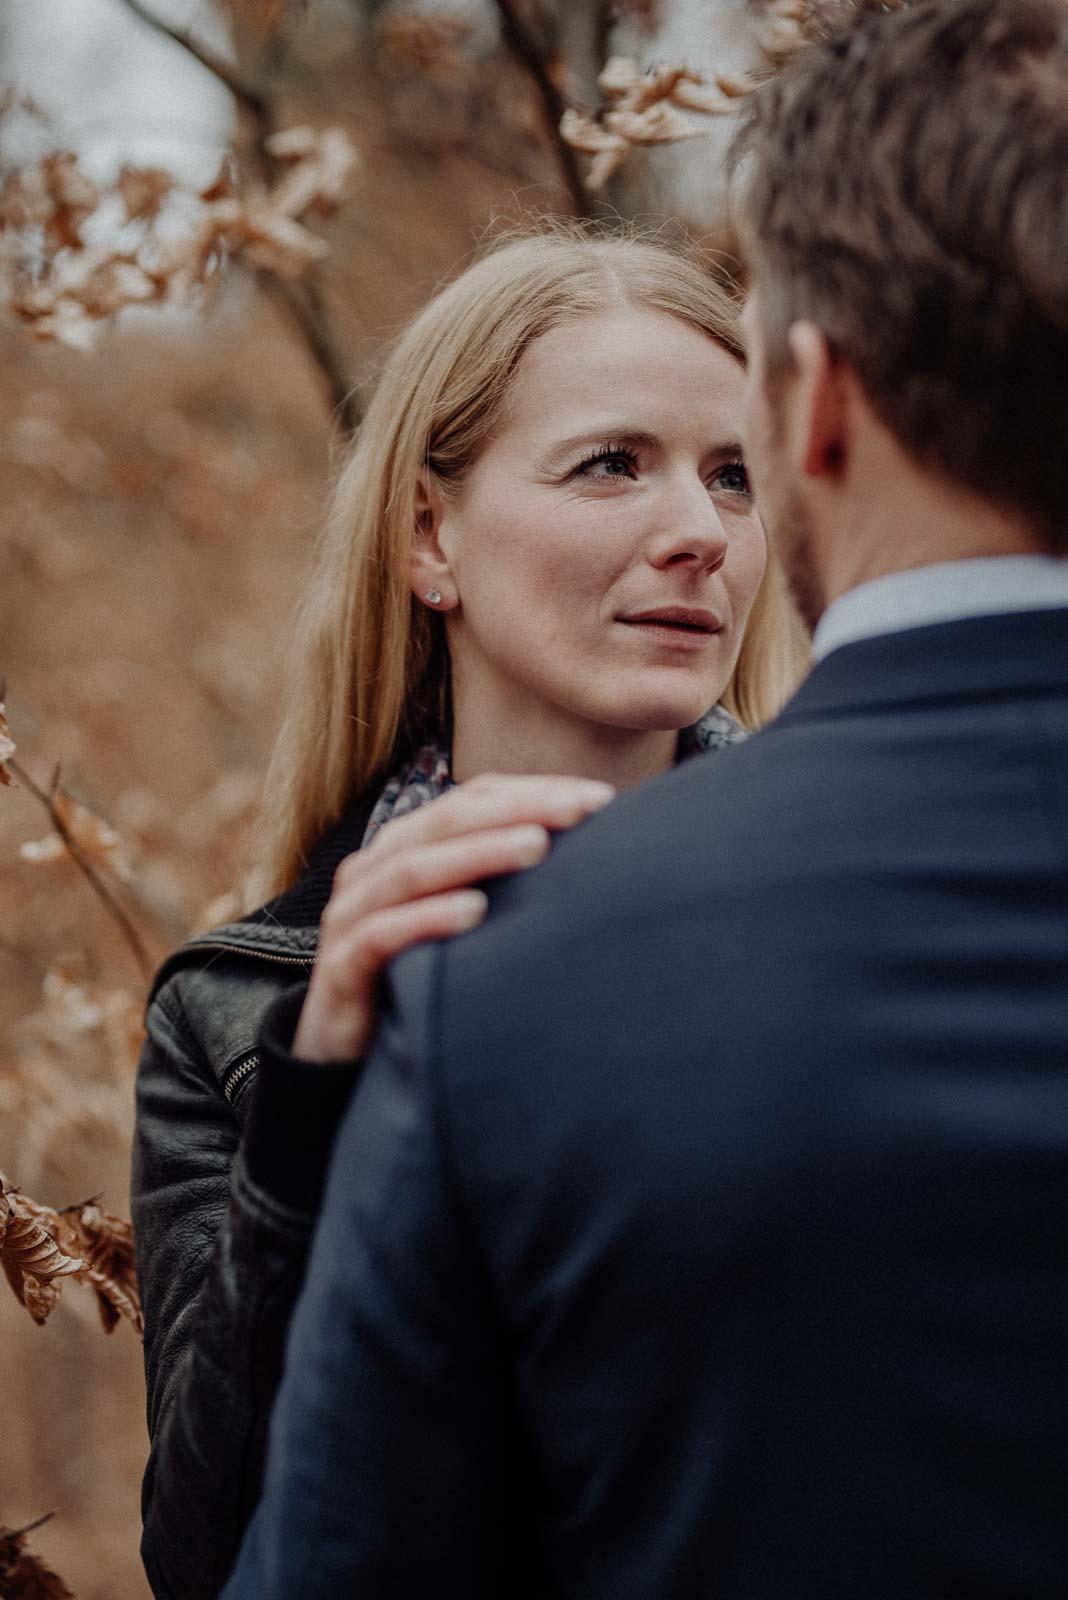 029-verlobungsshooting-engagement-fotograf-witten-rombergpark-dortmund